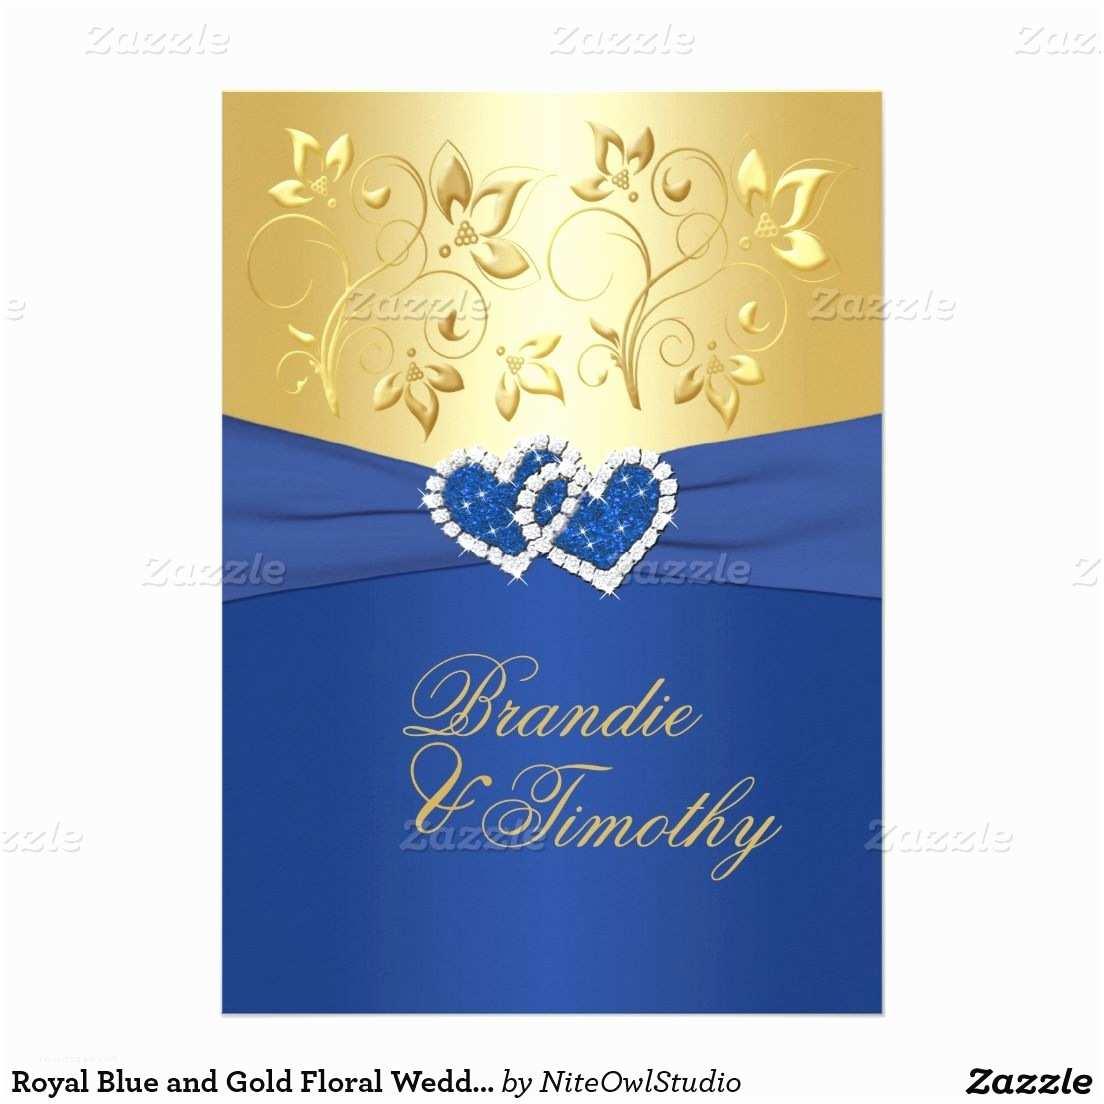 Royal Blue Wedding S Royal Blue And Gold Floral Wedding